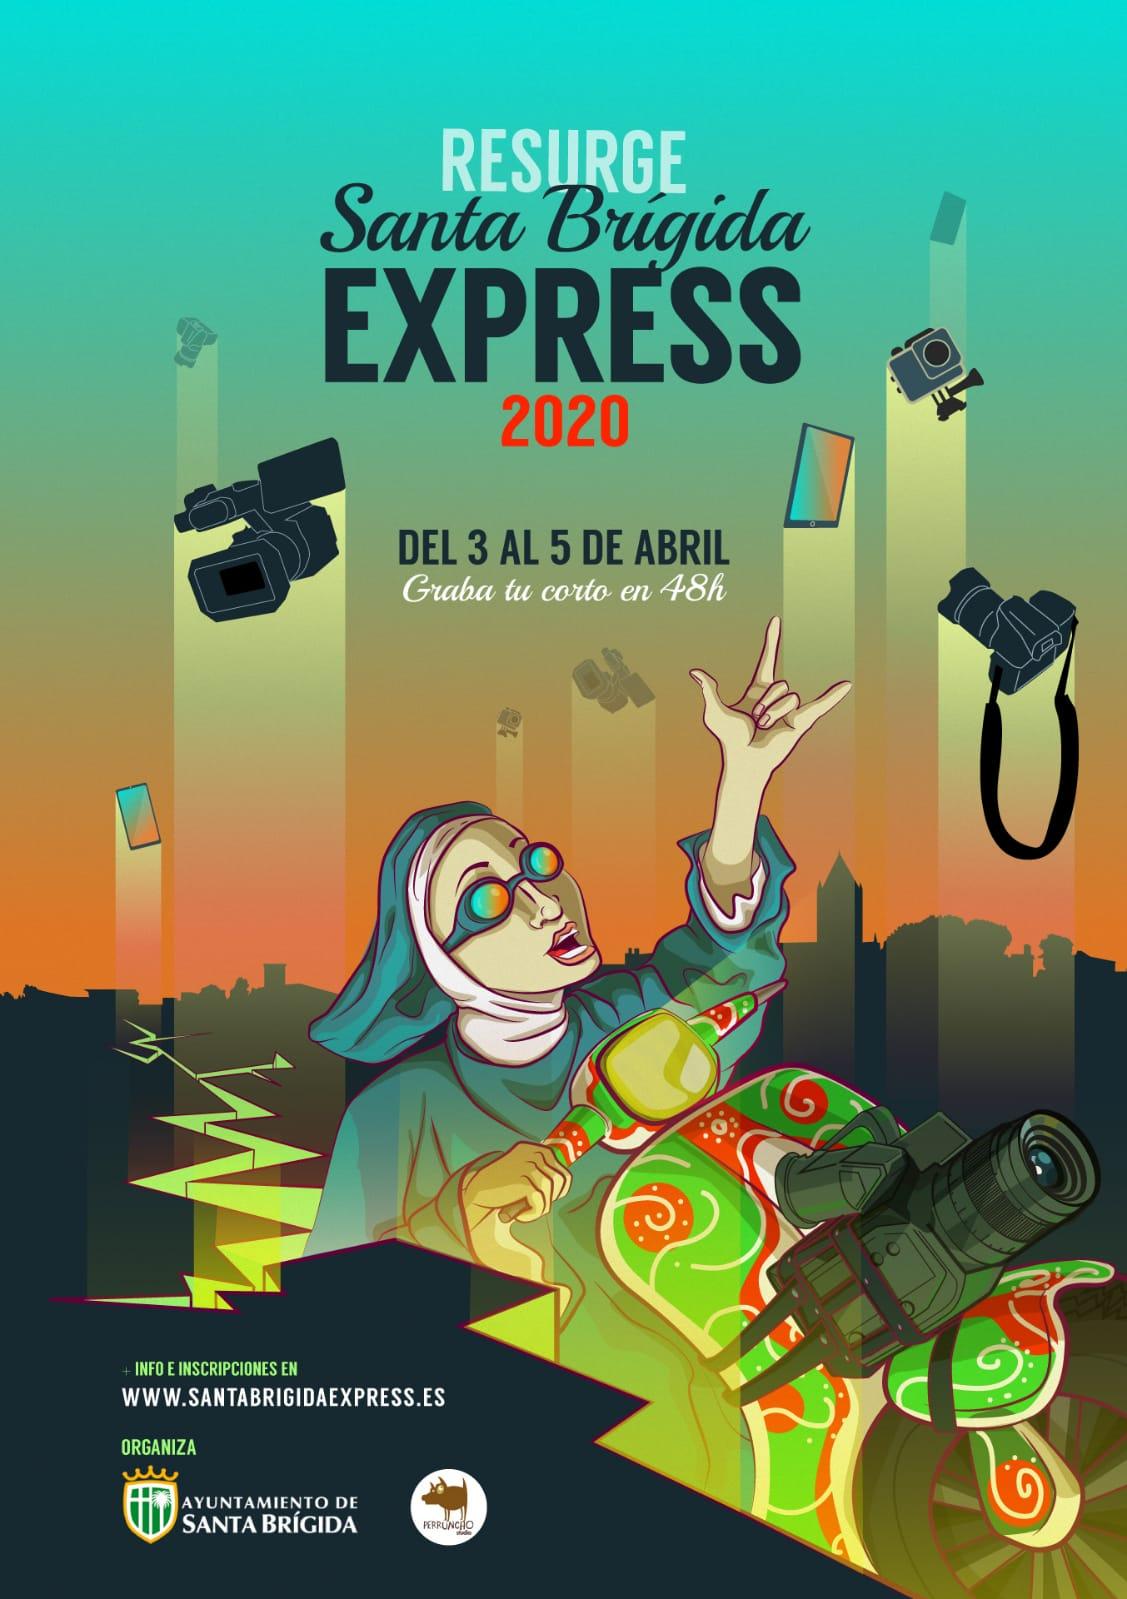 SANTA BRÍGIDA EXPRESS 2020